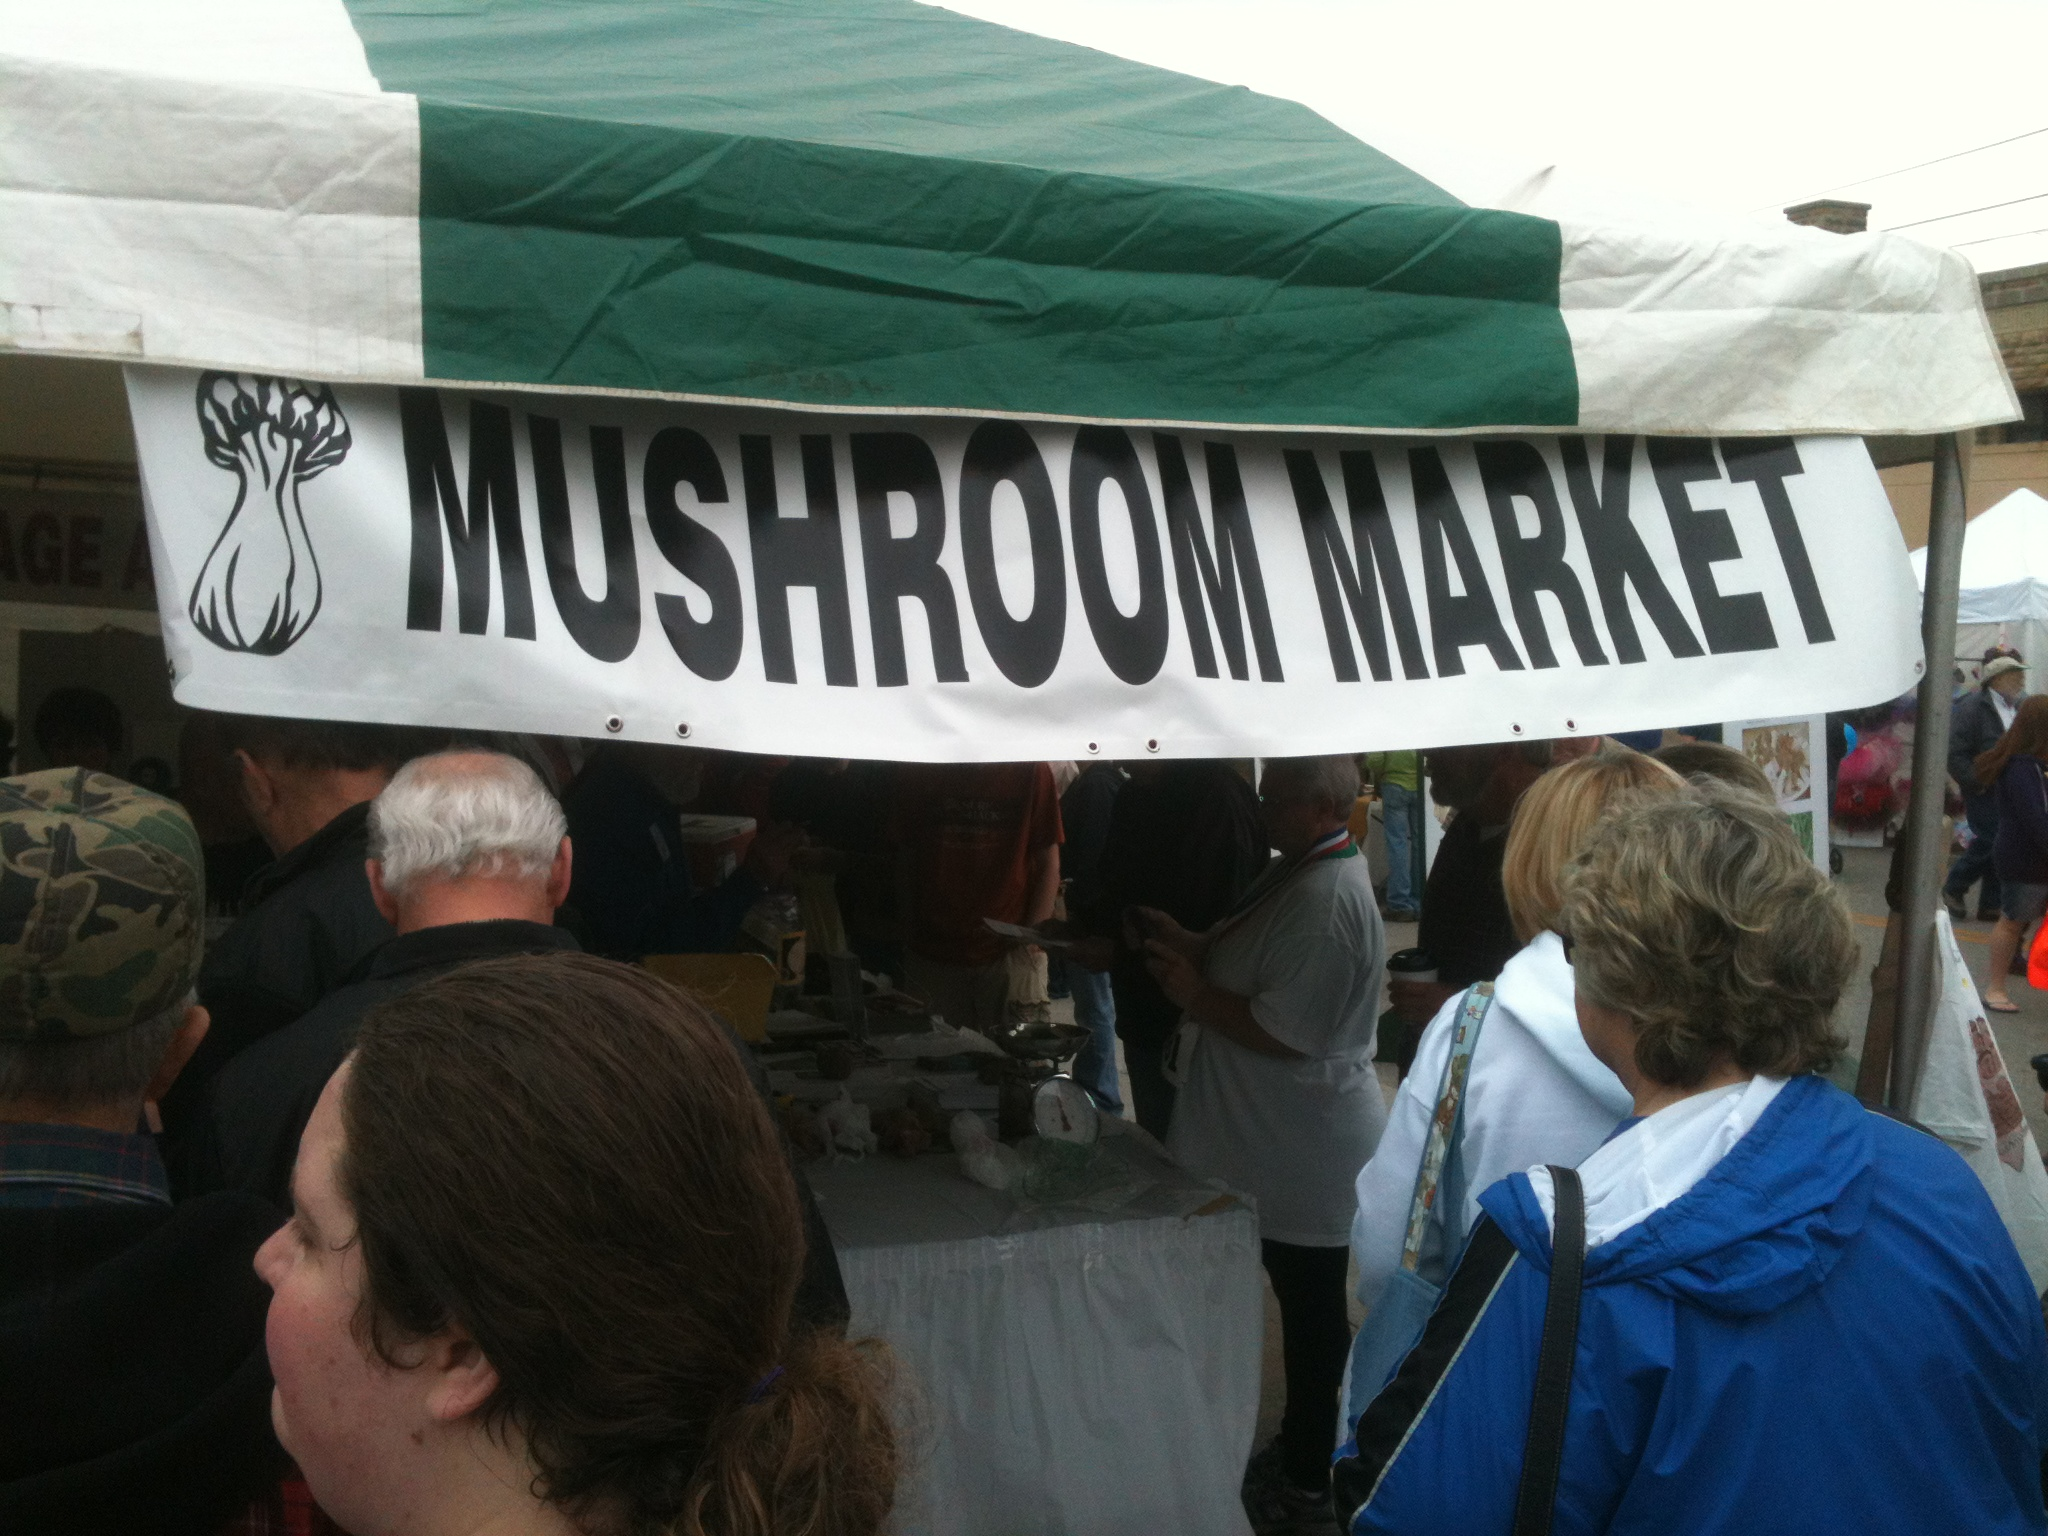 Mountain Mushroom Festival 2013 | opidells